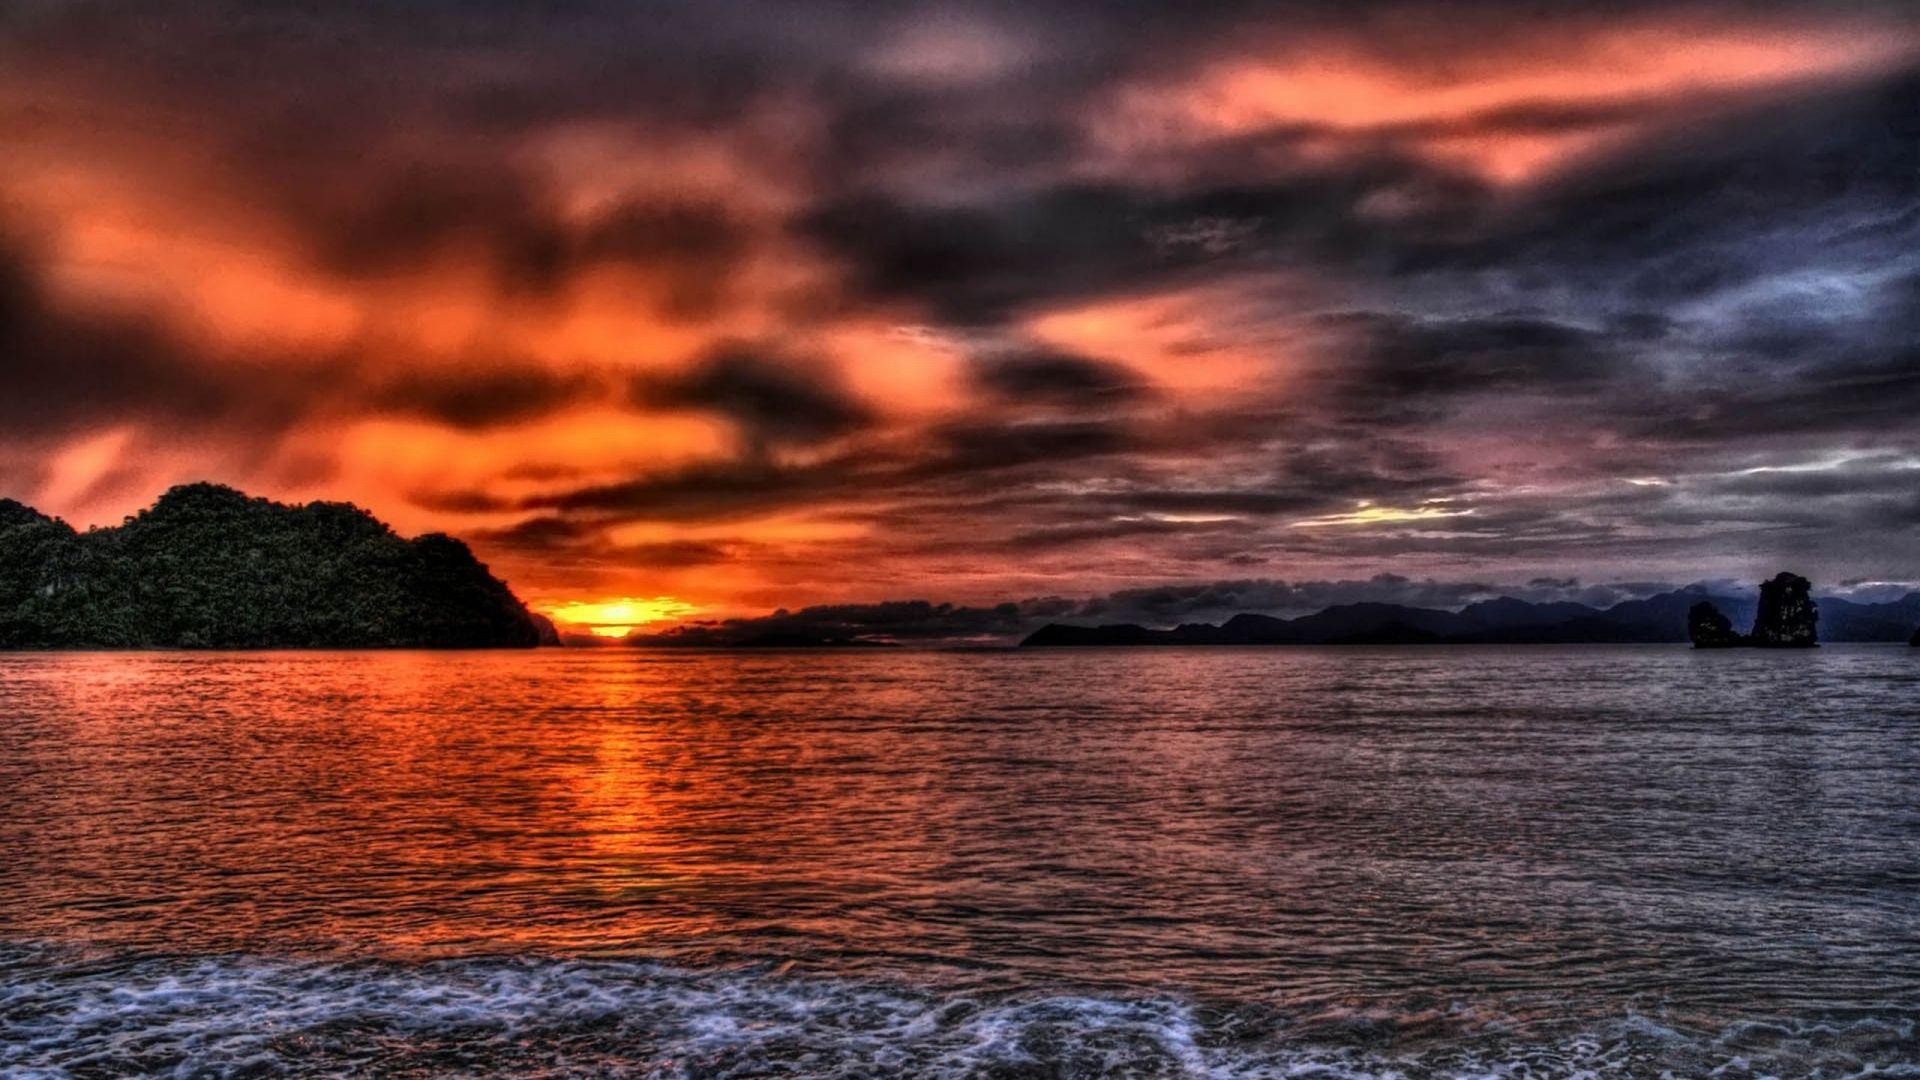 Download Wallpaper 1920x1080 Sea Mountains Sky Light Sunset Full Hd 1080p Hd Background Scenery Wallpaper Sunset Nature Beautiful Sunset